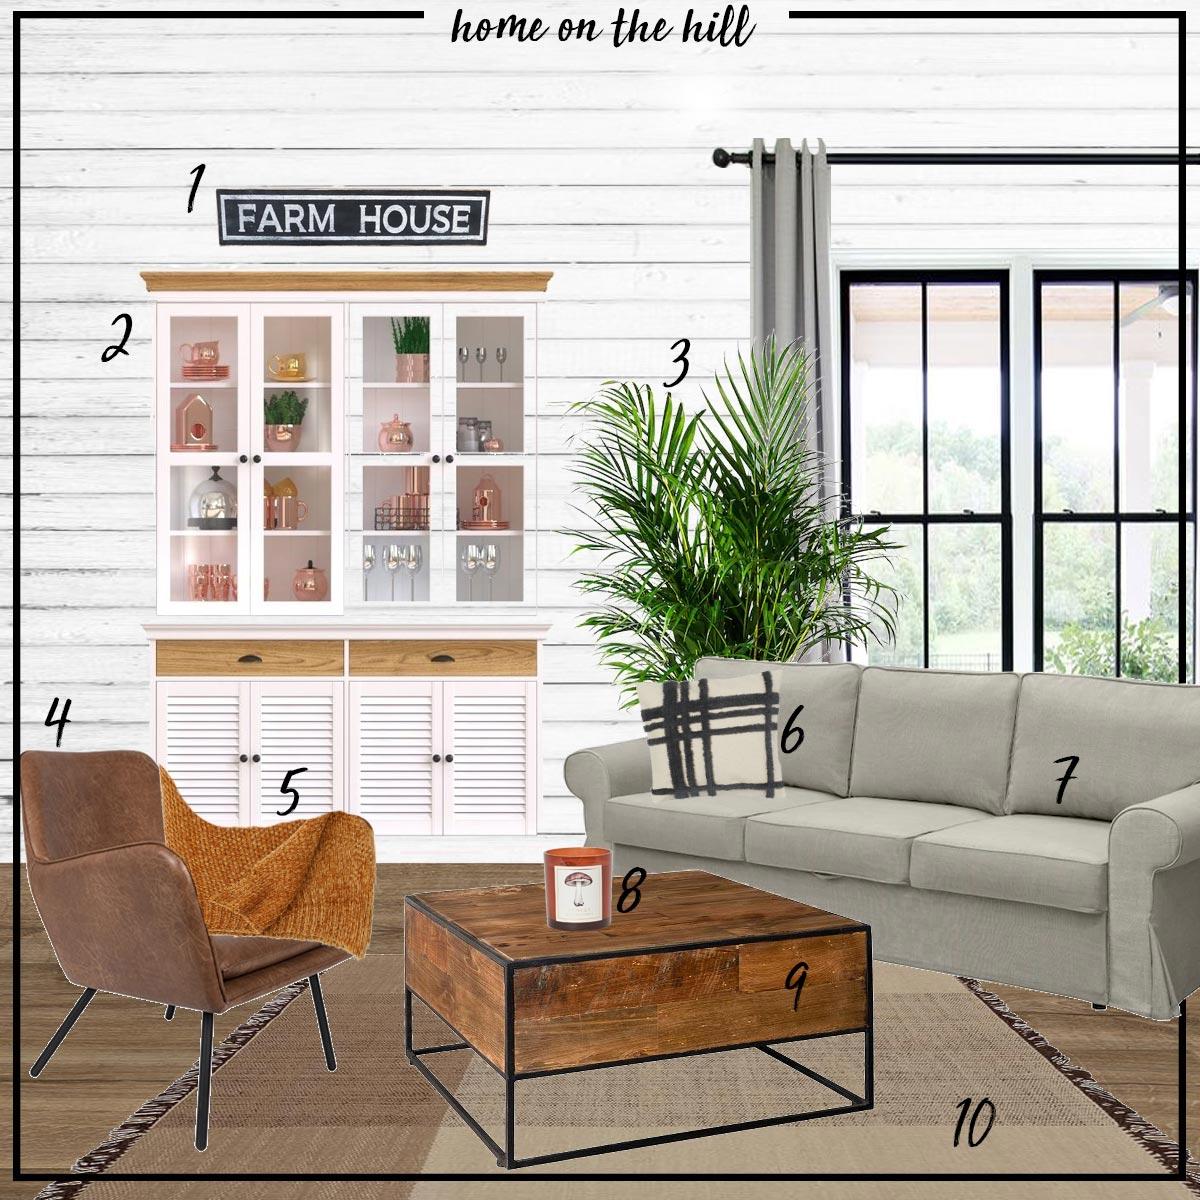 wnetrze-farmhouse-inspiracja-moodboard